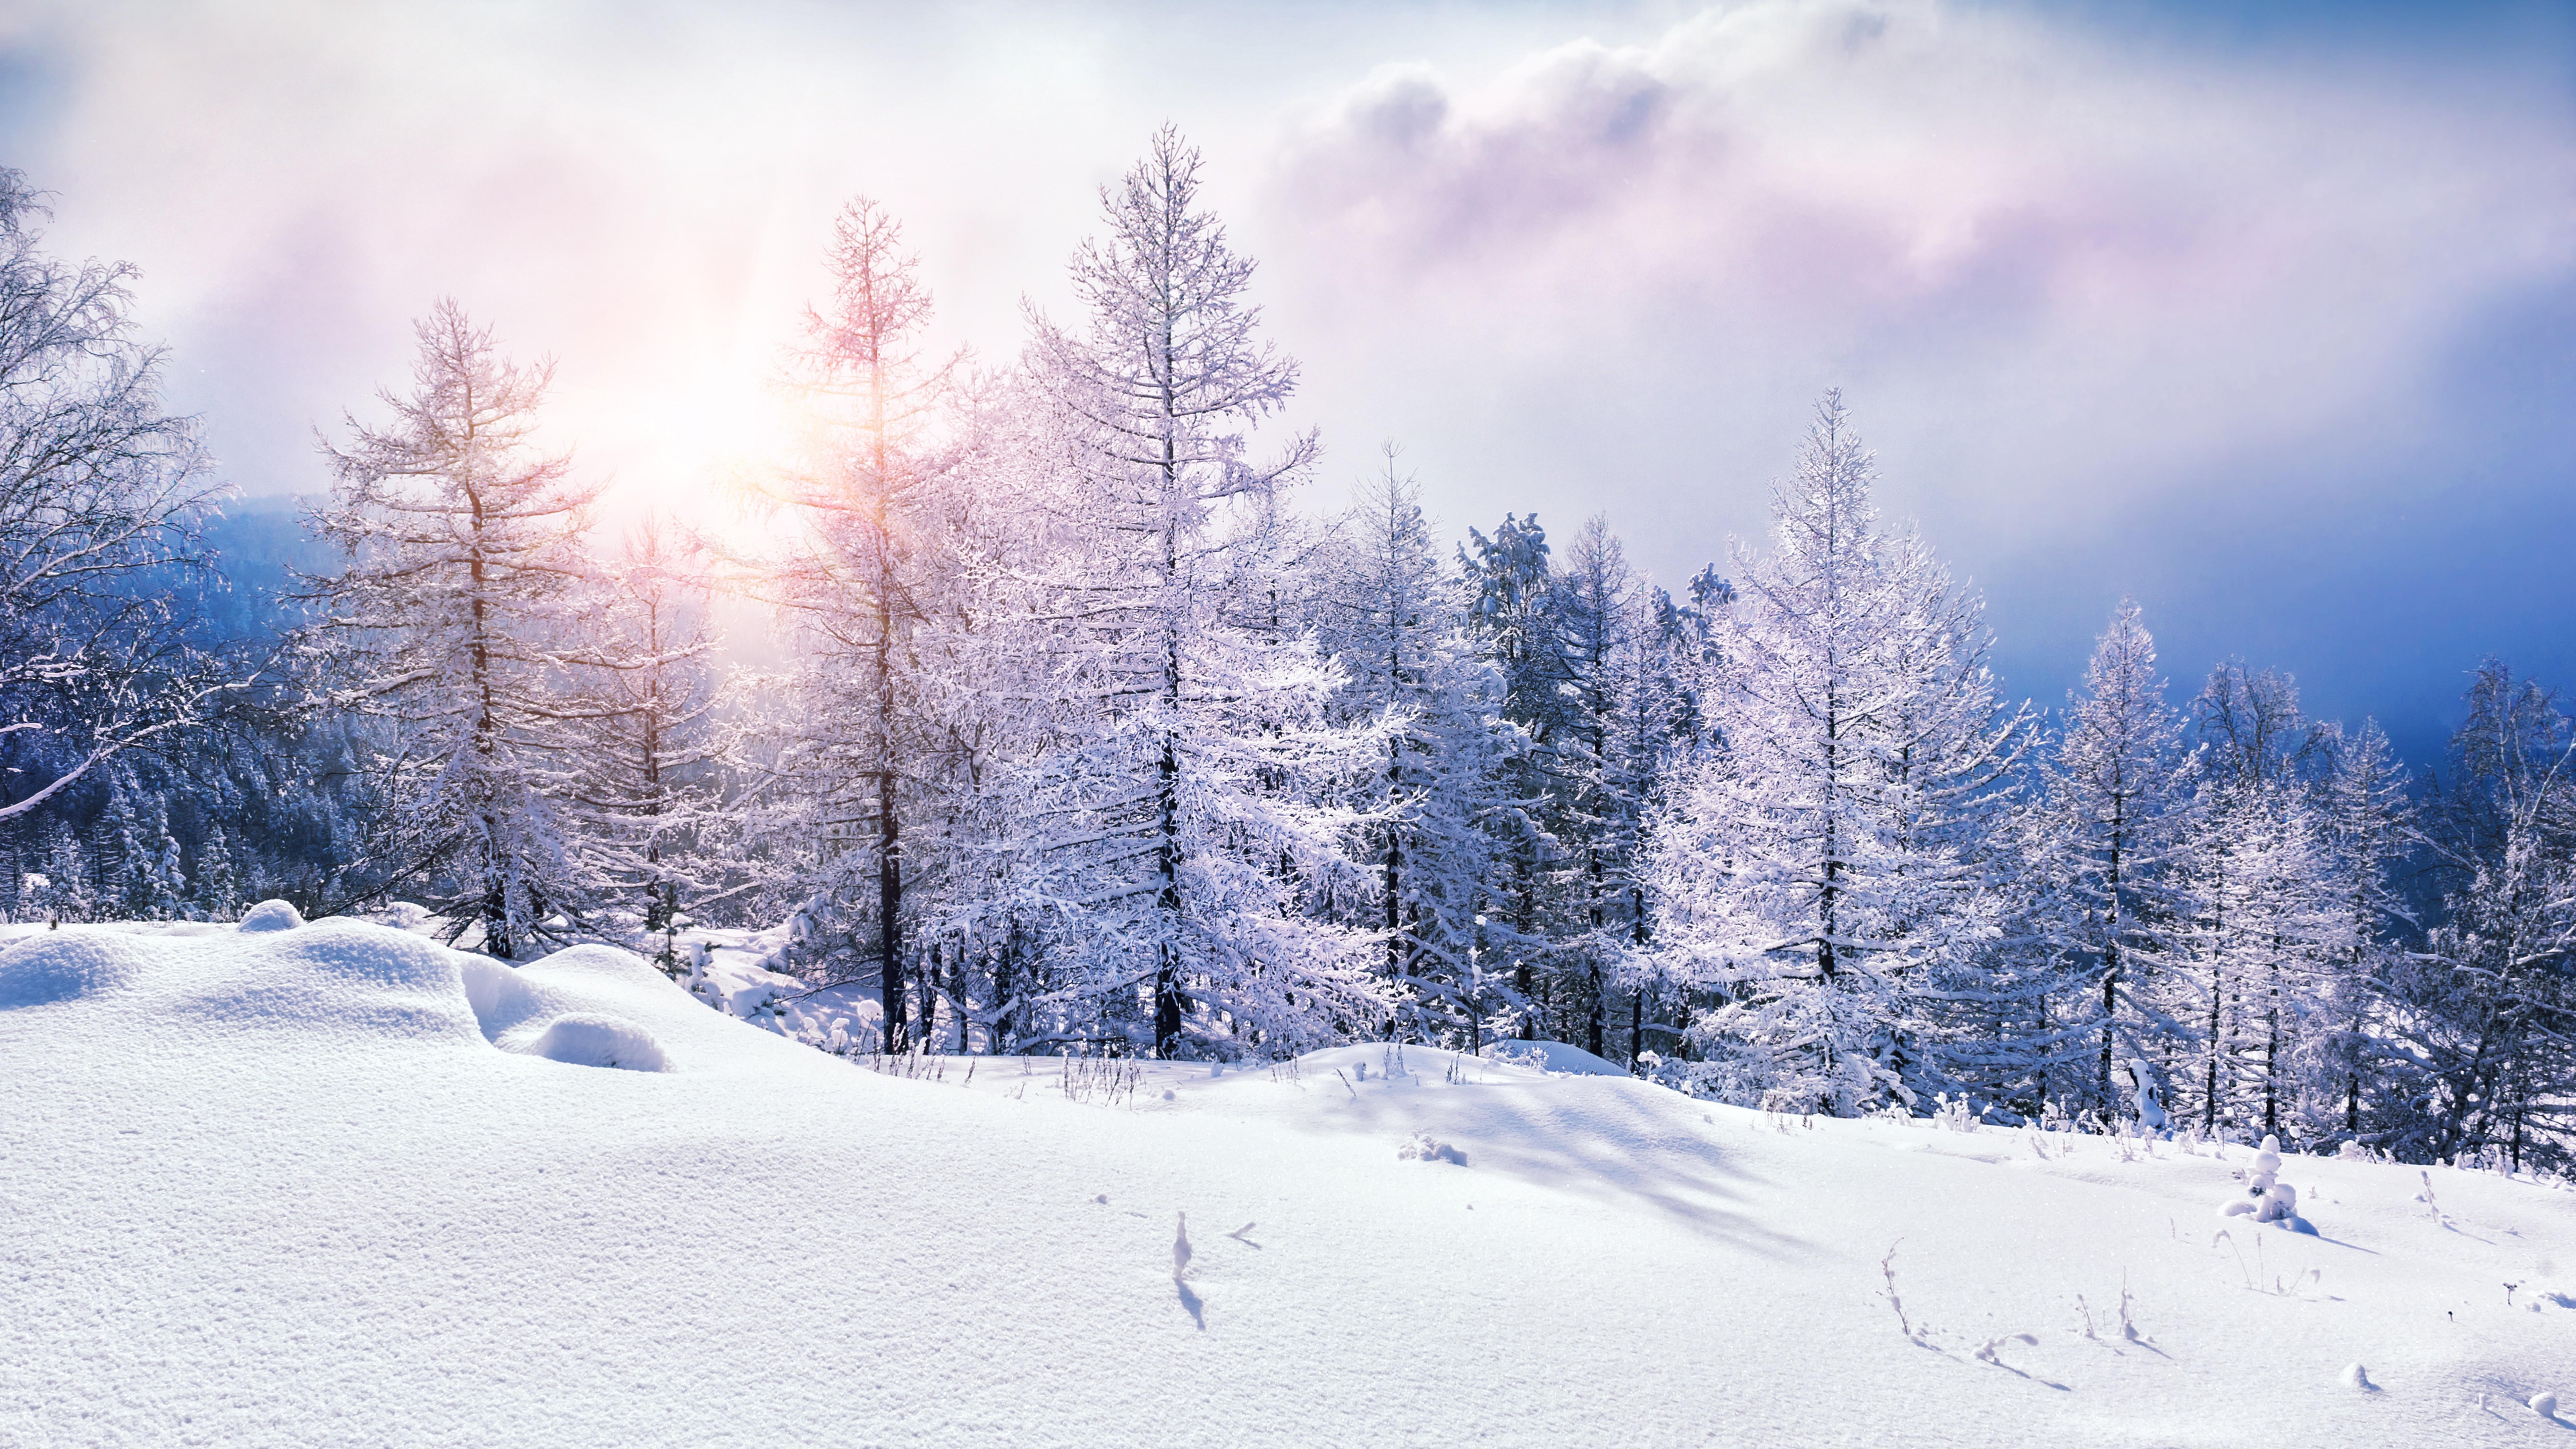 3d Moon Night Wallpaper Wallpaper Forest Snow Winter Clouds 8k Nature 17356